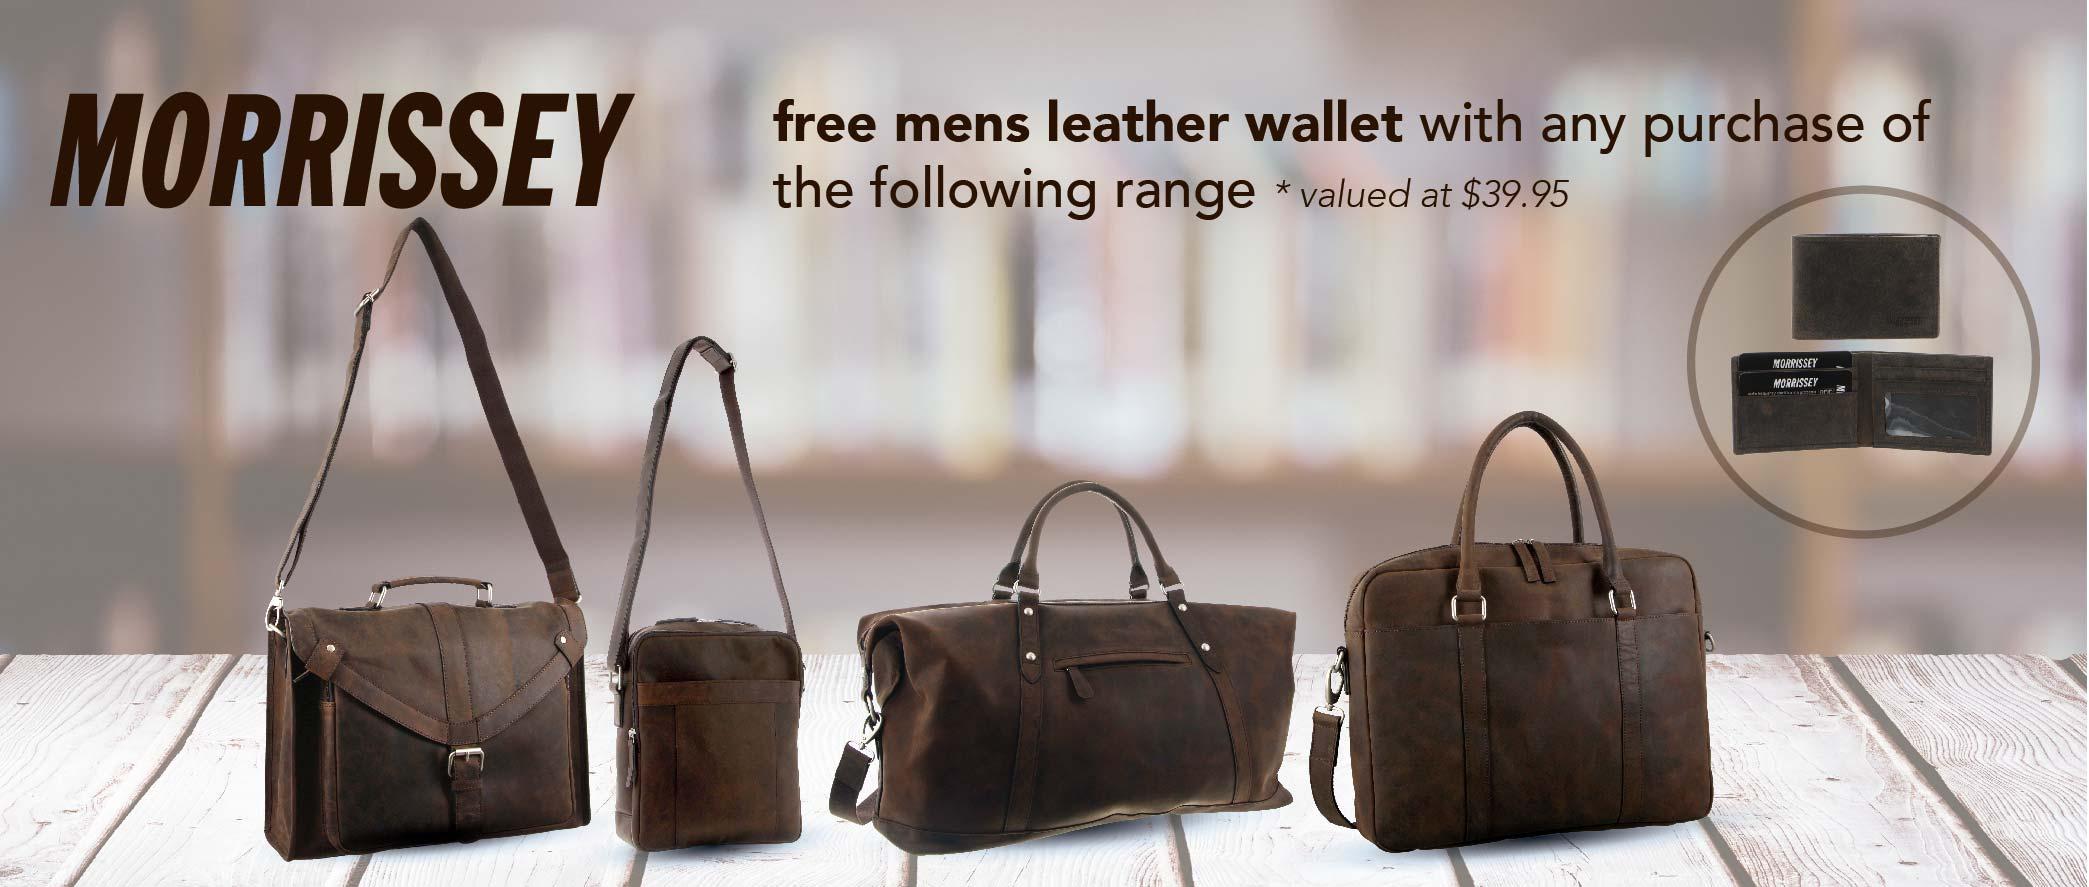 mo-lifestyle-men-s-rustic-web-banner-free-wallet-03-03.jpg